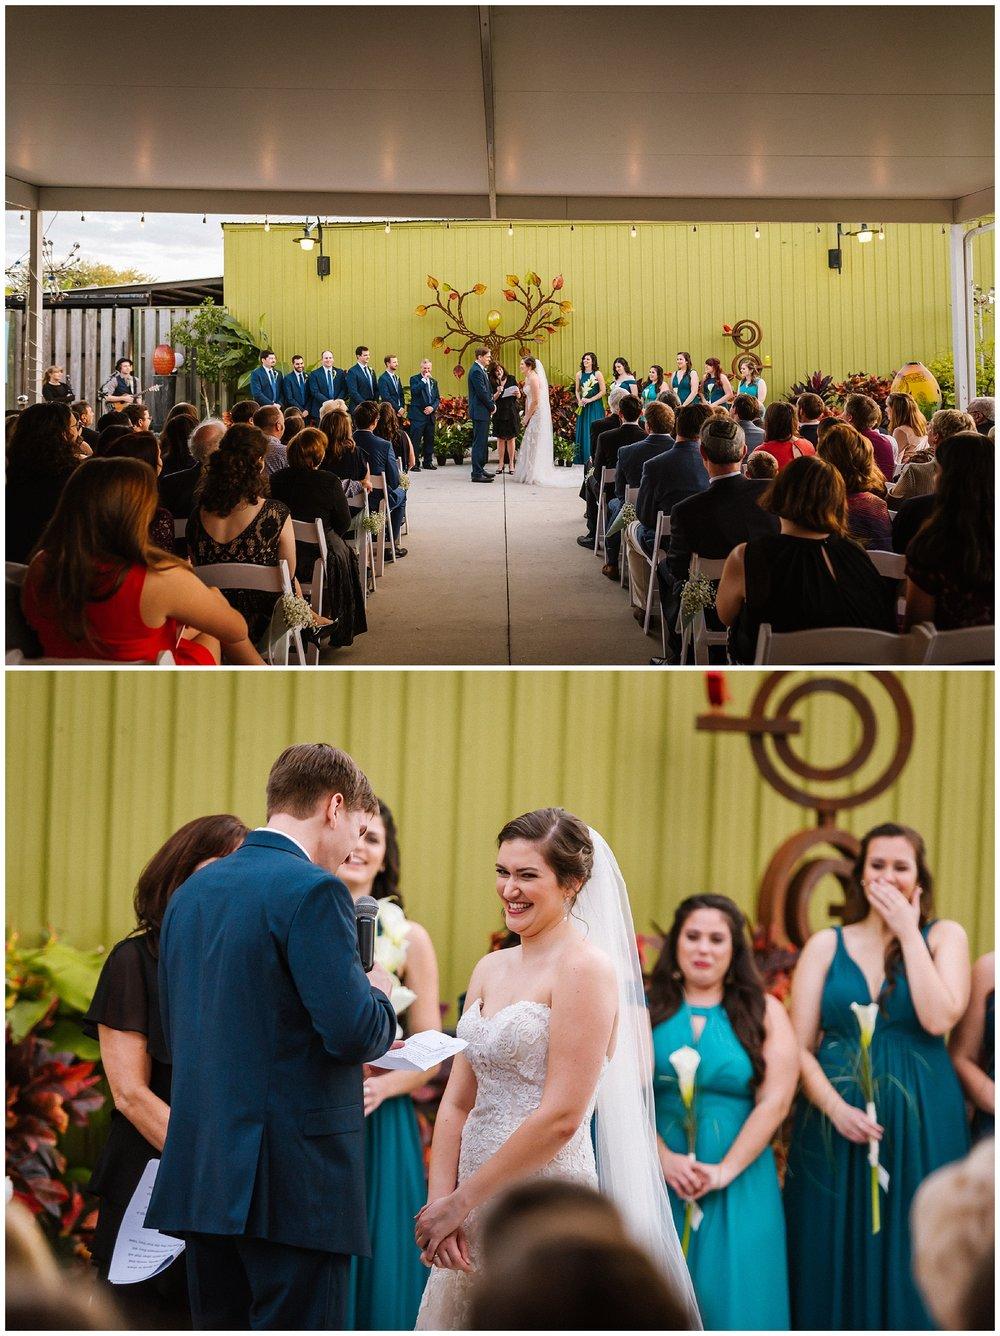 St-pete-wedding-photography-unique-glass-blowing-gallery-succulent-art_0030.jpg